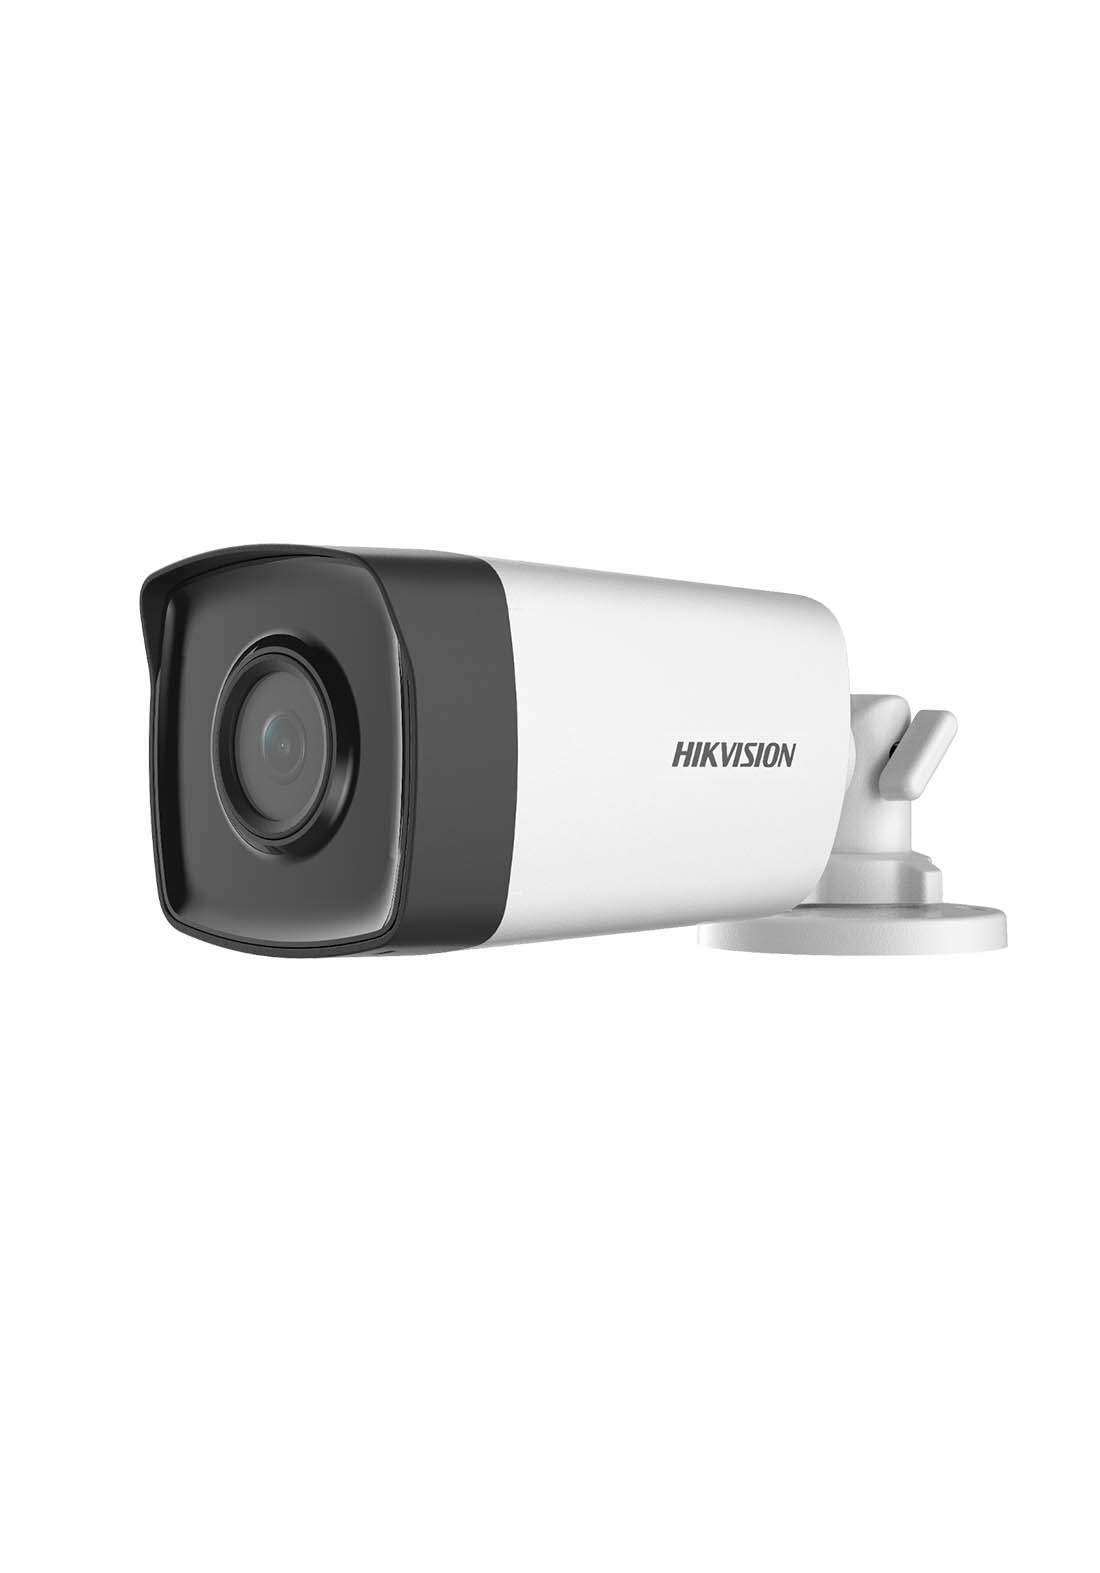 Hikvision DS-2CE17D0T-IT5F 2MP 3.6mm Turbo Camera - White كاميرا مراقبة